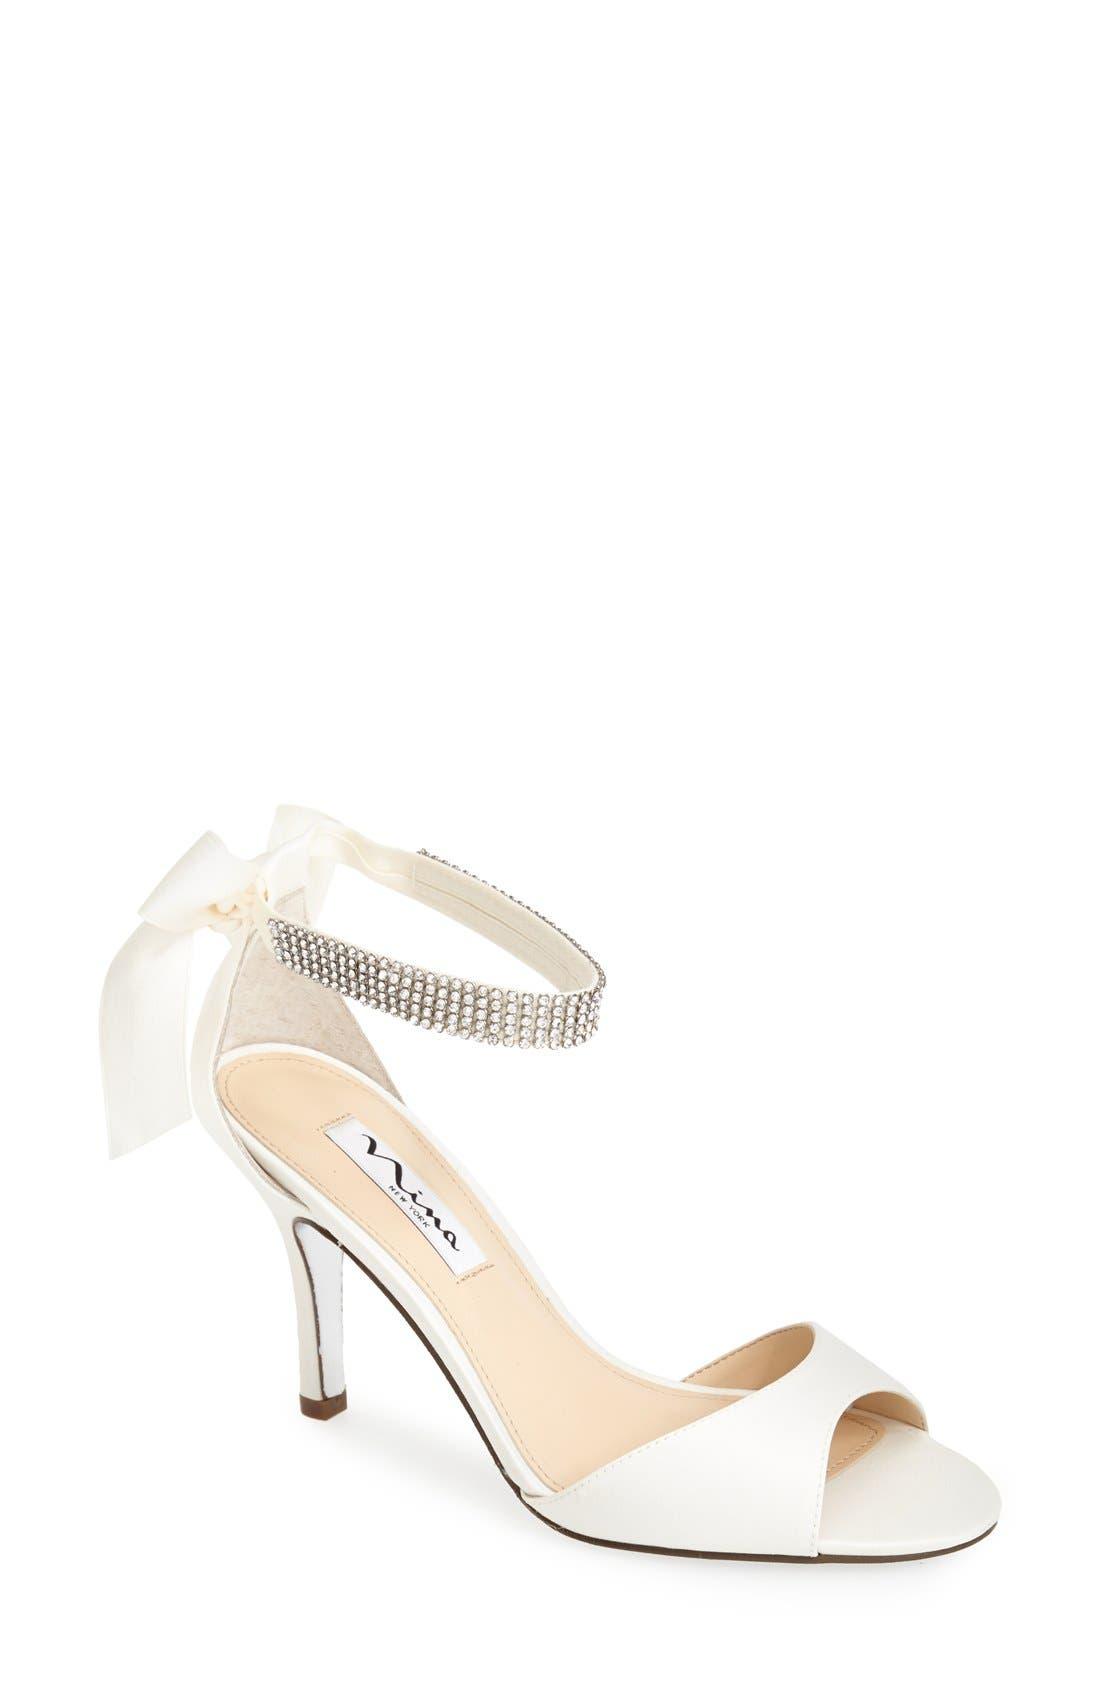 NINA, 'Vinnie' Crystal Embellished Ankle Strap Sandal, Main thumbnail 1, color, IVORY